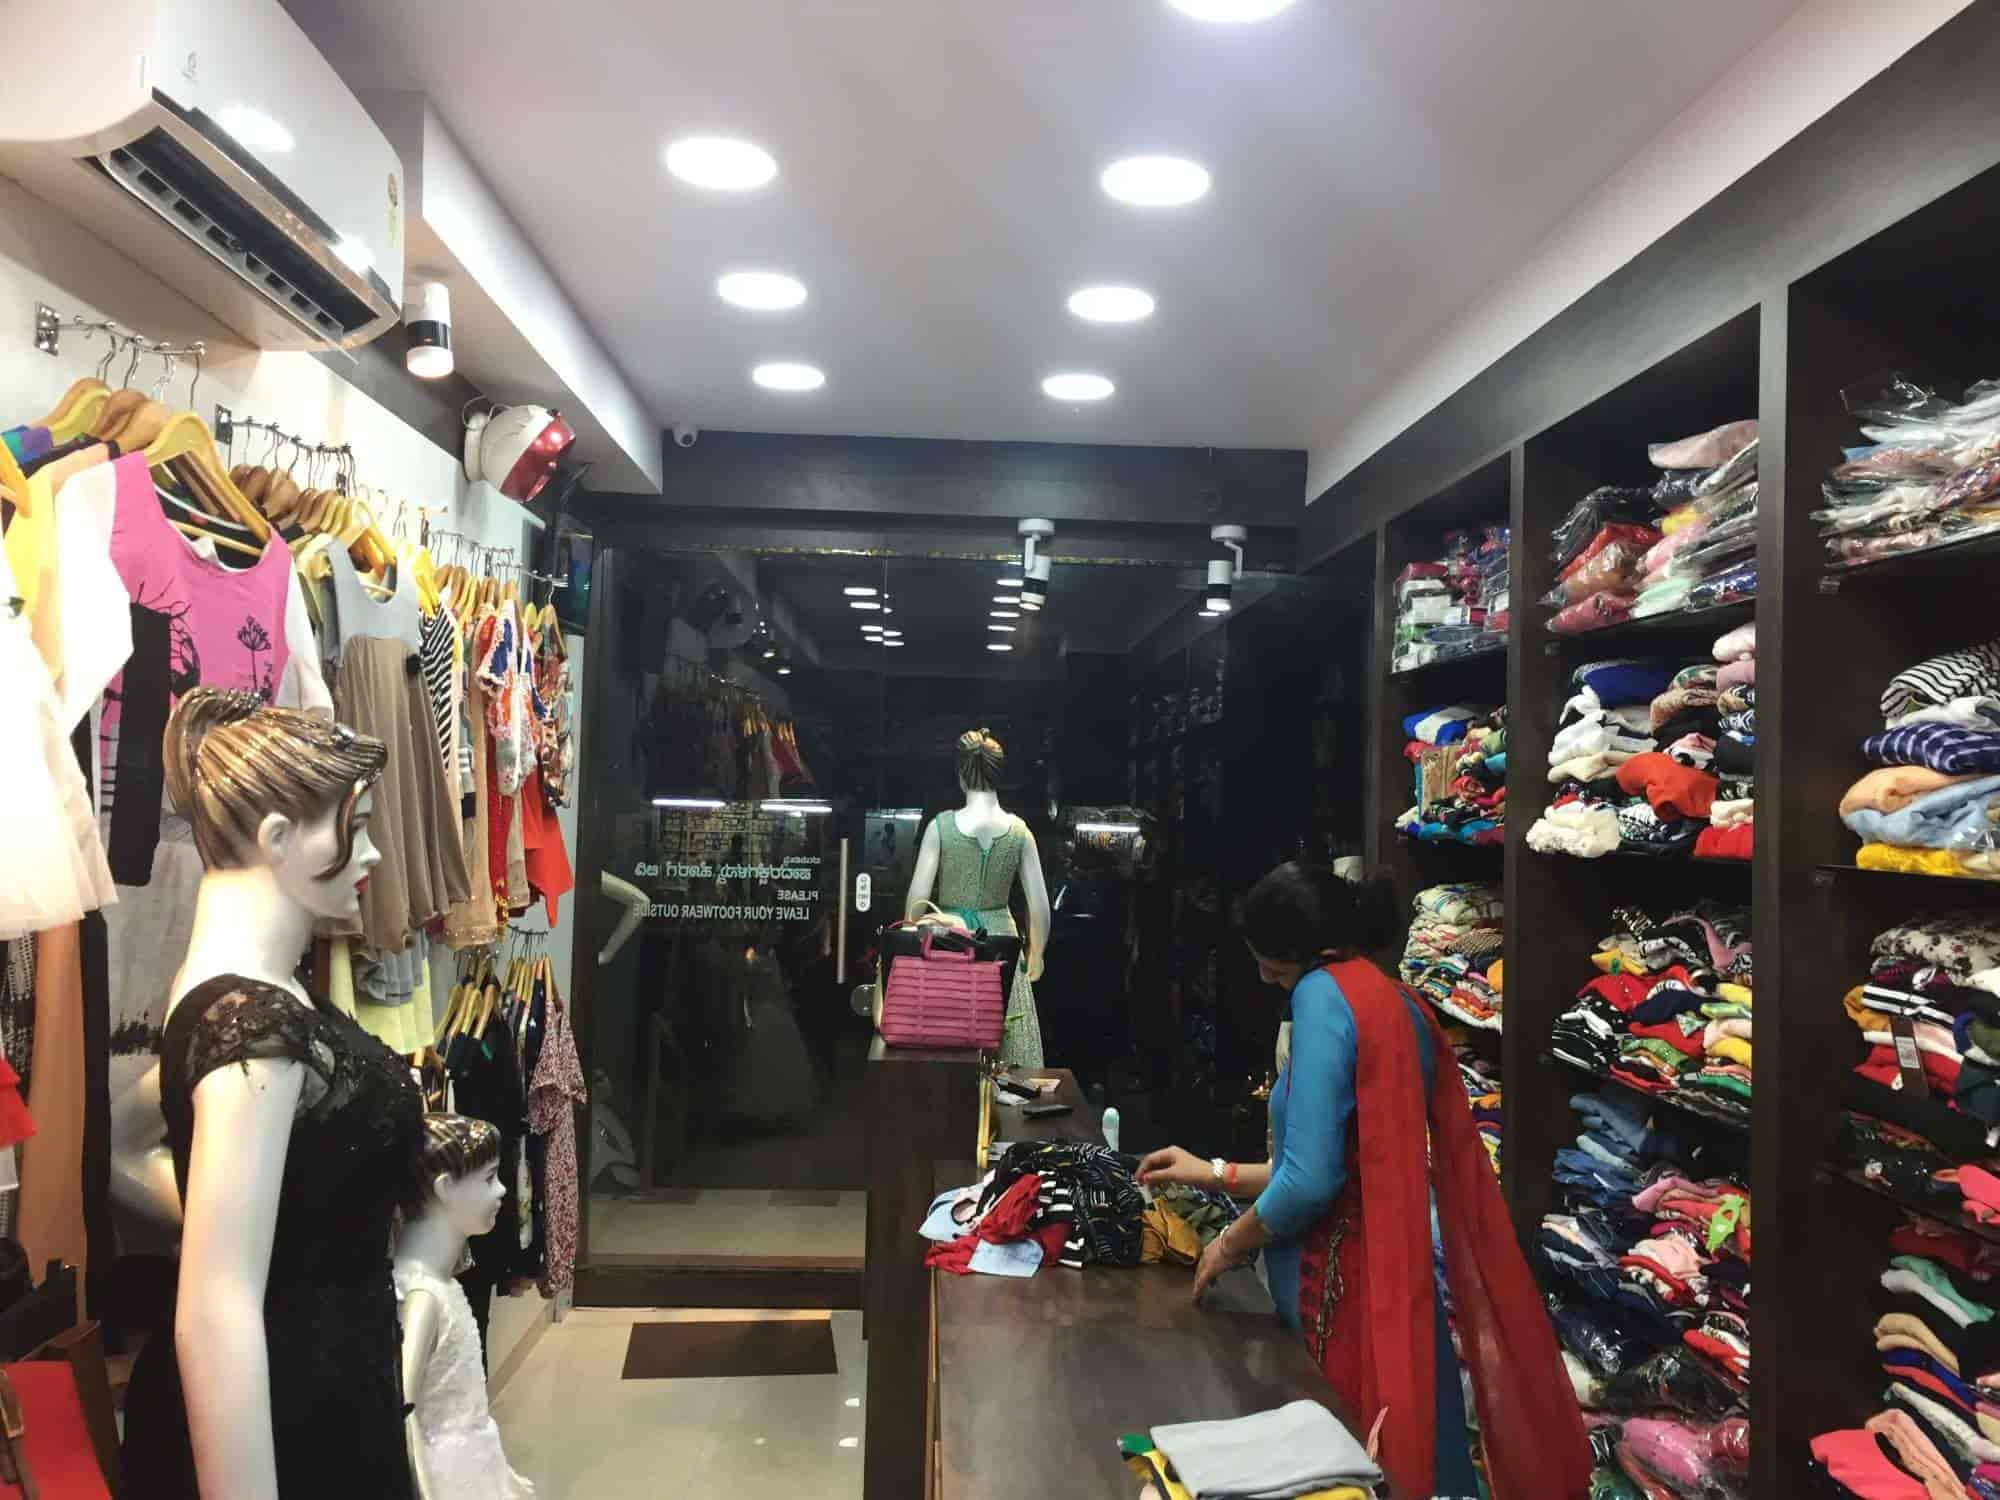 b3f2ec6ceb9 Top 100 Kriti Western Maternity Ladies Readymade Garment Retailers ...